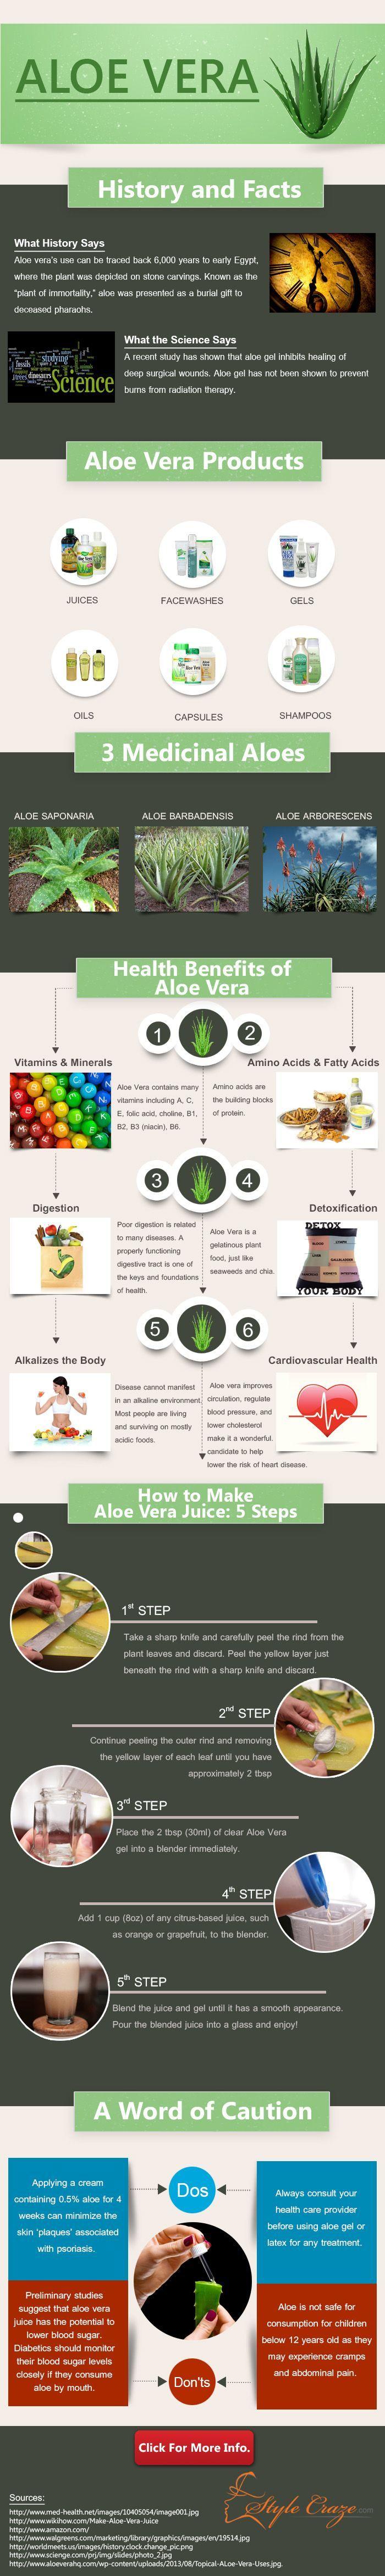 Amazing Benefits Of Aloe Vera https://www.facebook.com/groups/gillianajonesforever/